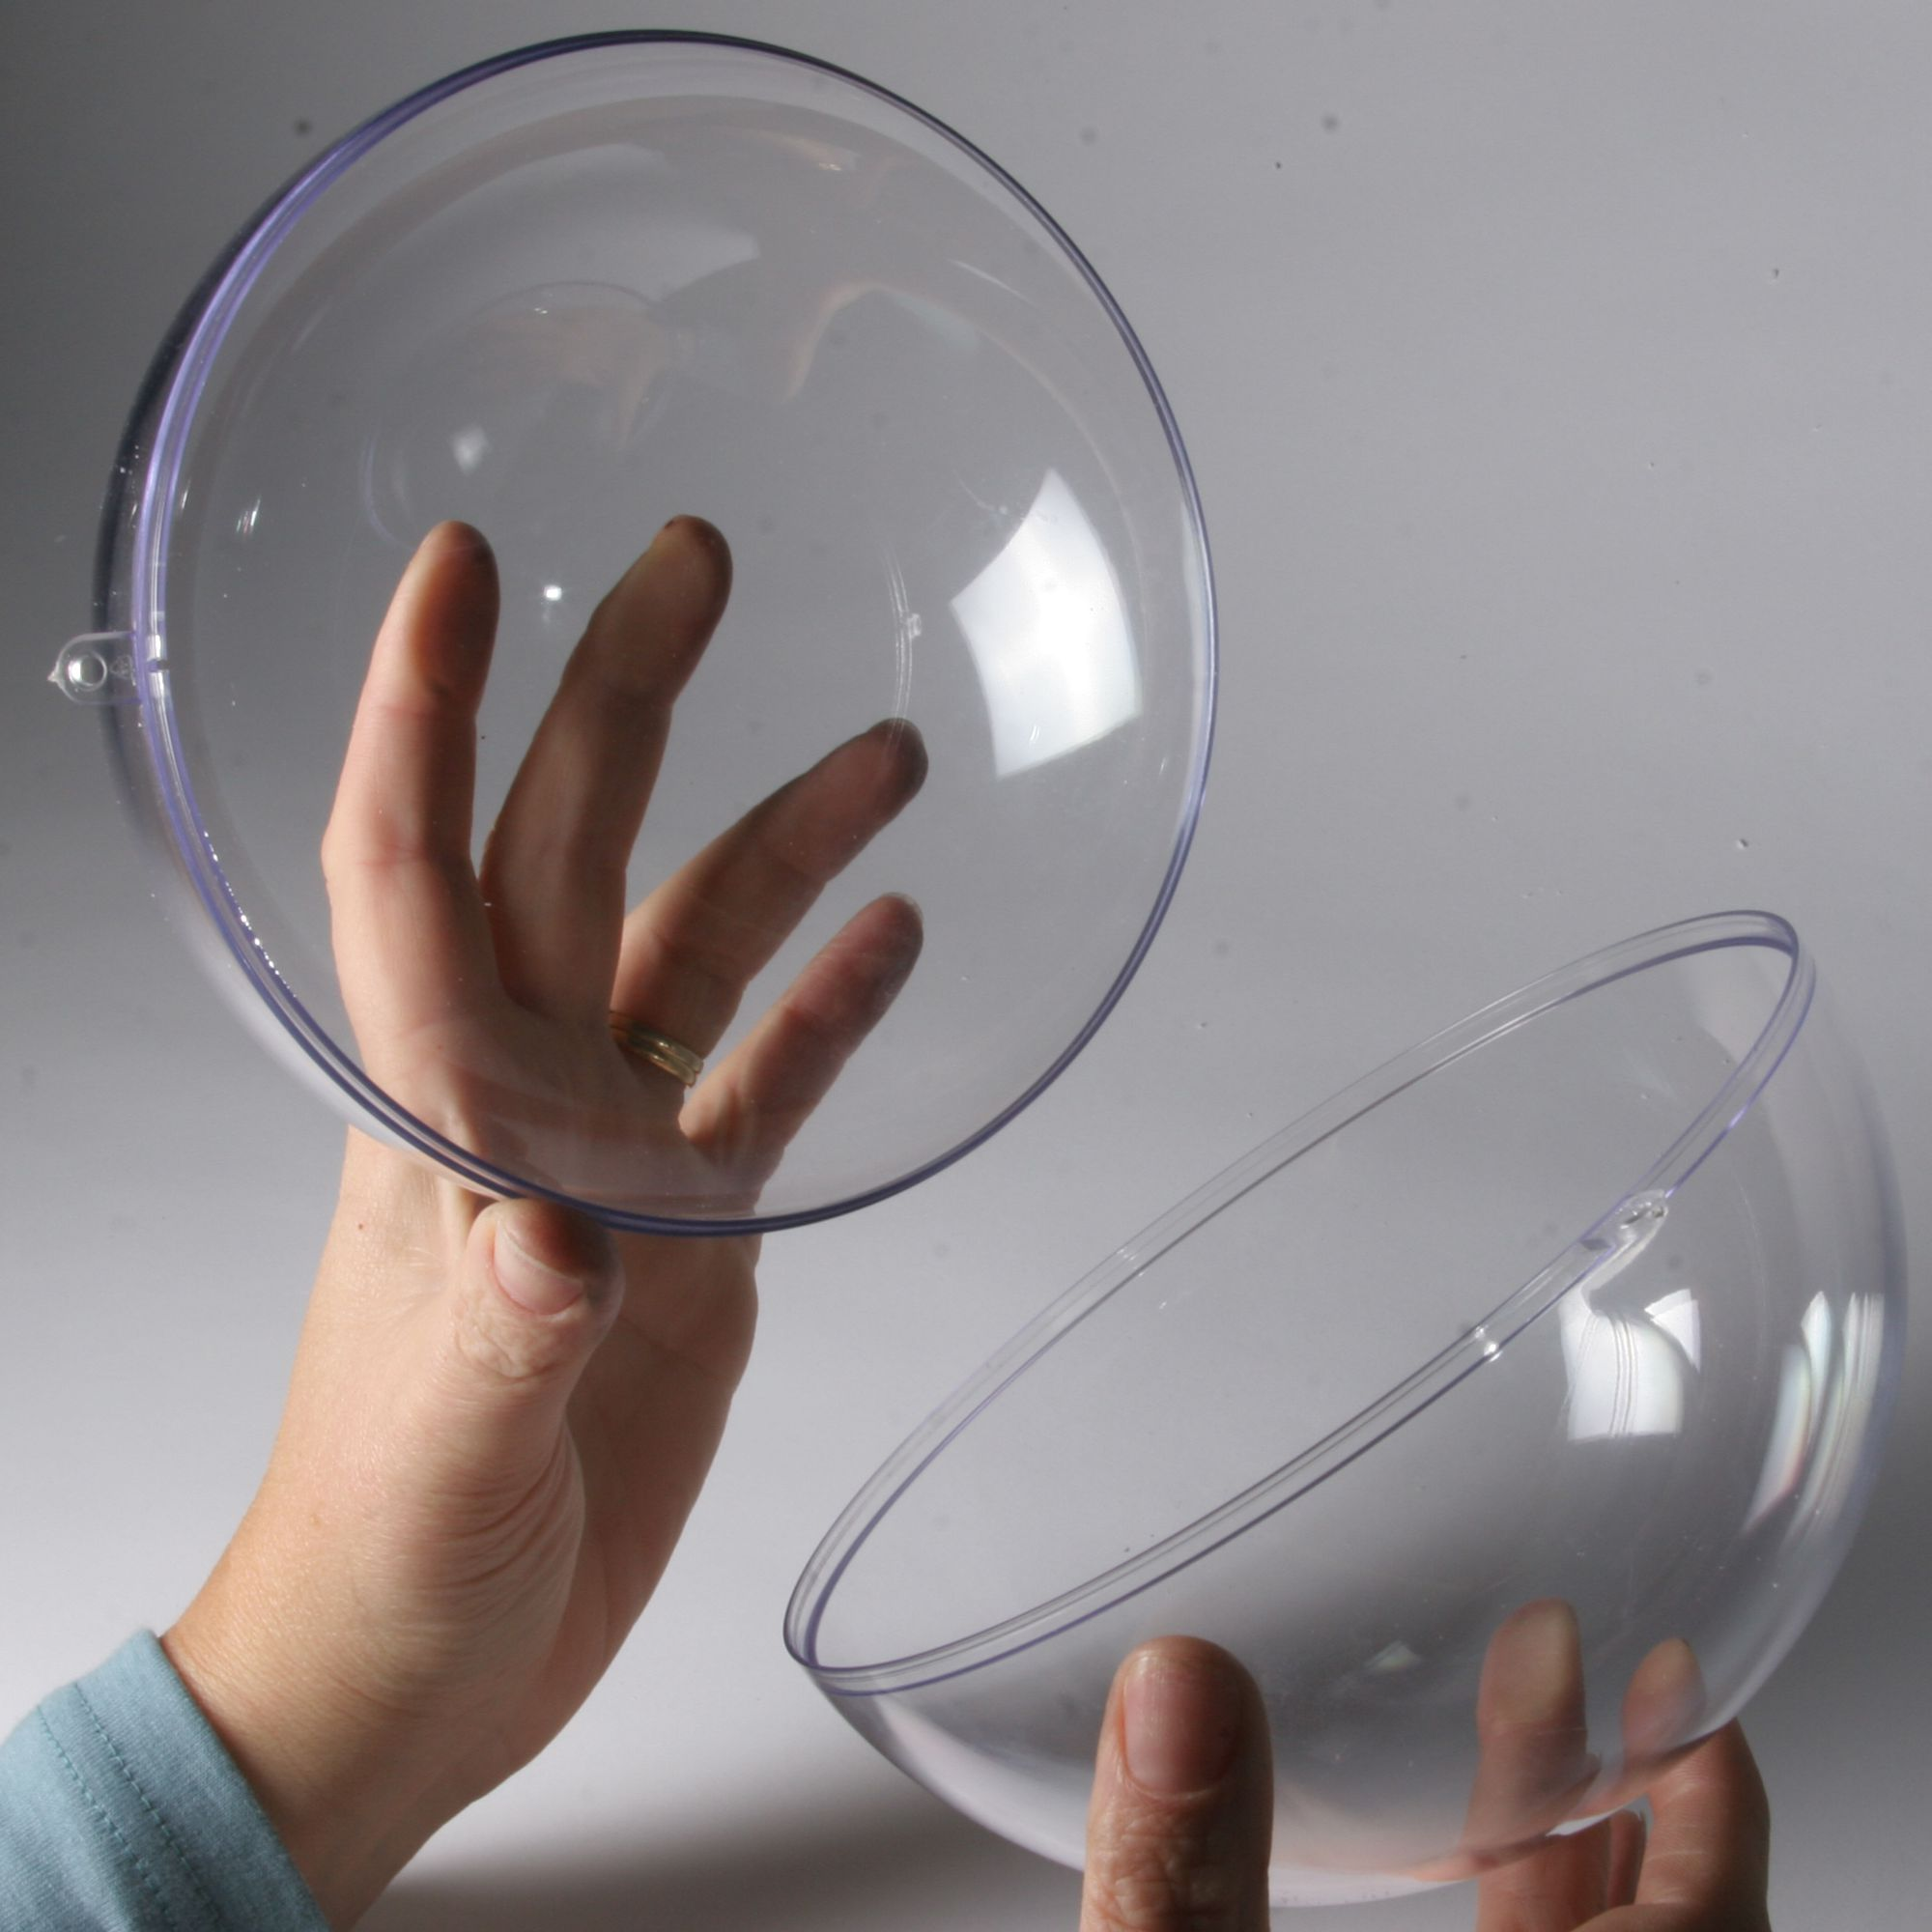 banner transparent download Clear plastic balls for. Ball transparent sphere